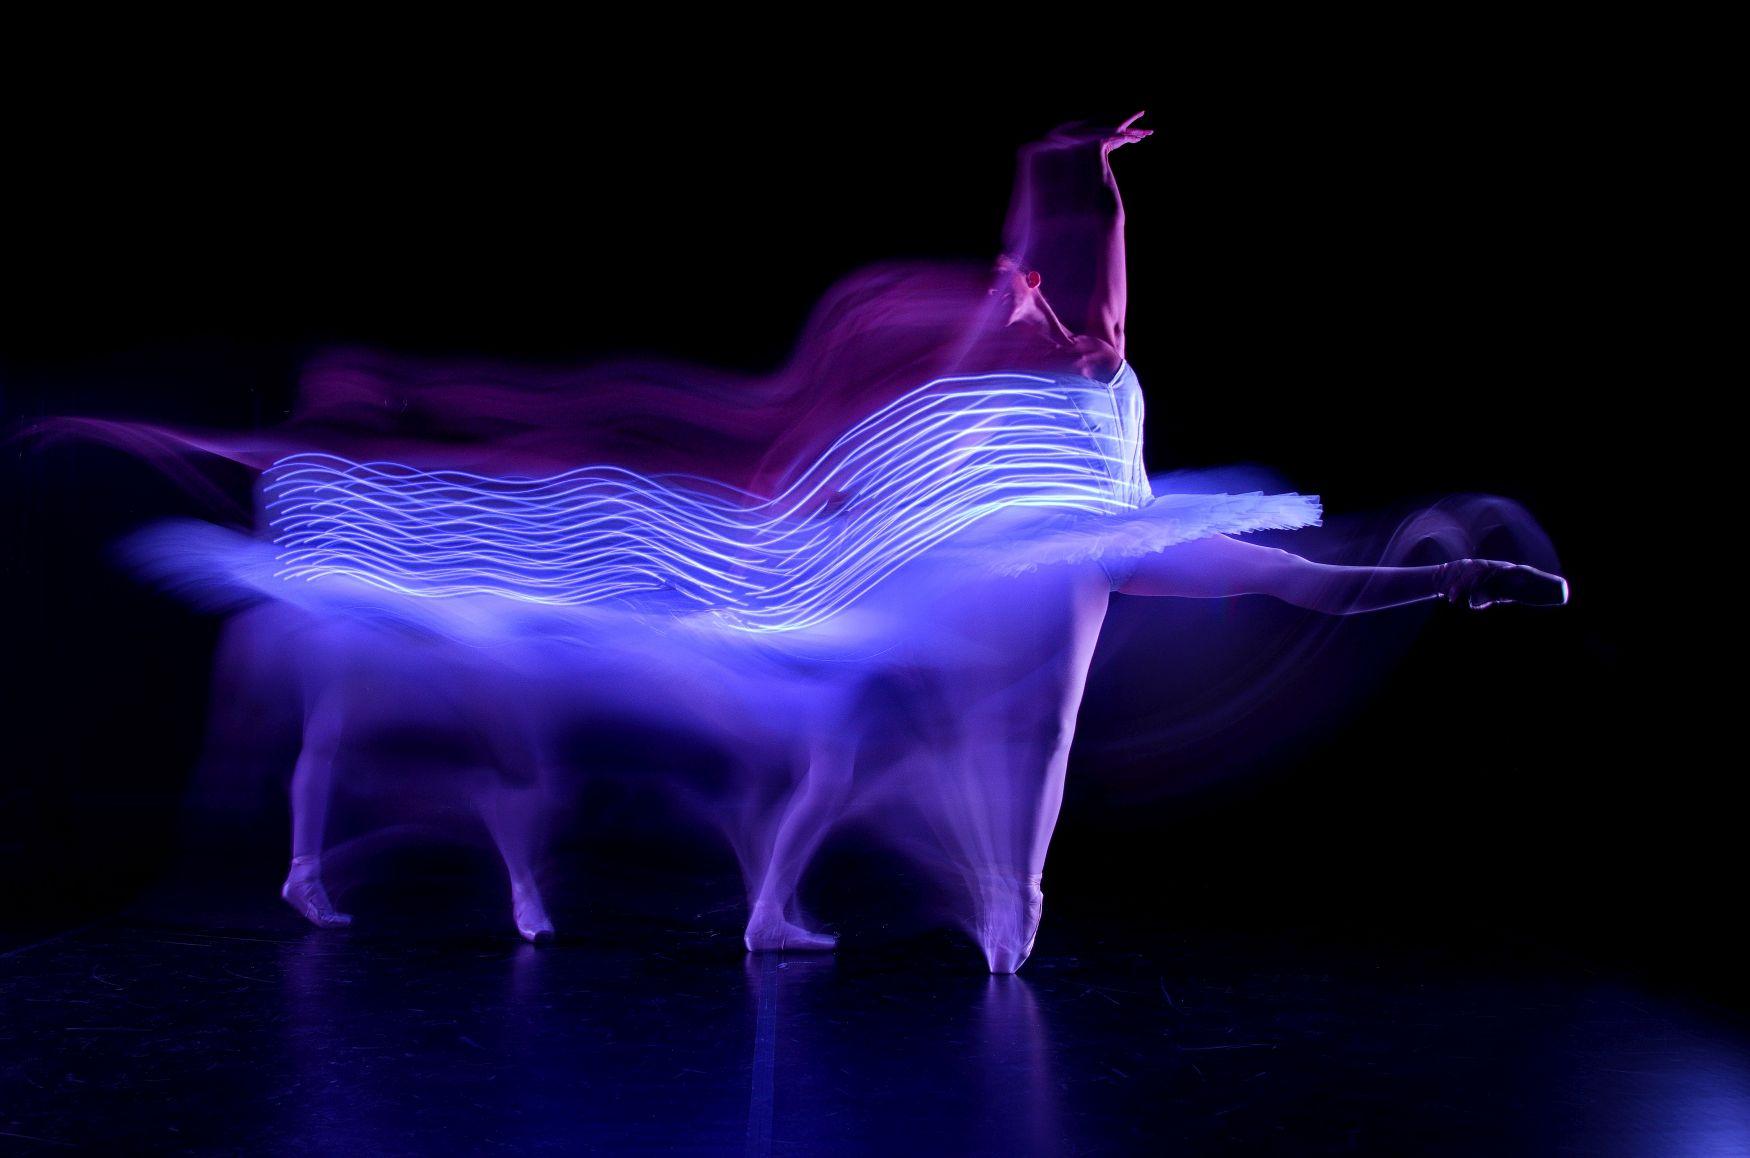 5-Nikon-D3400-Ballet.jpg